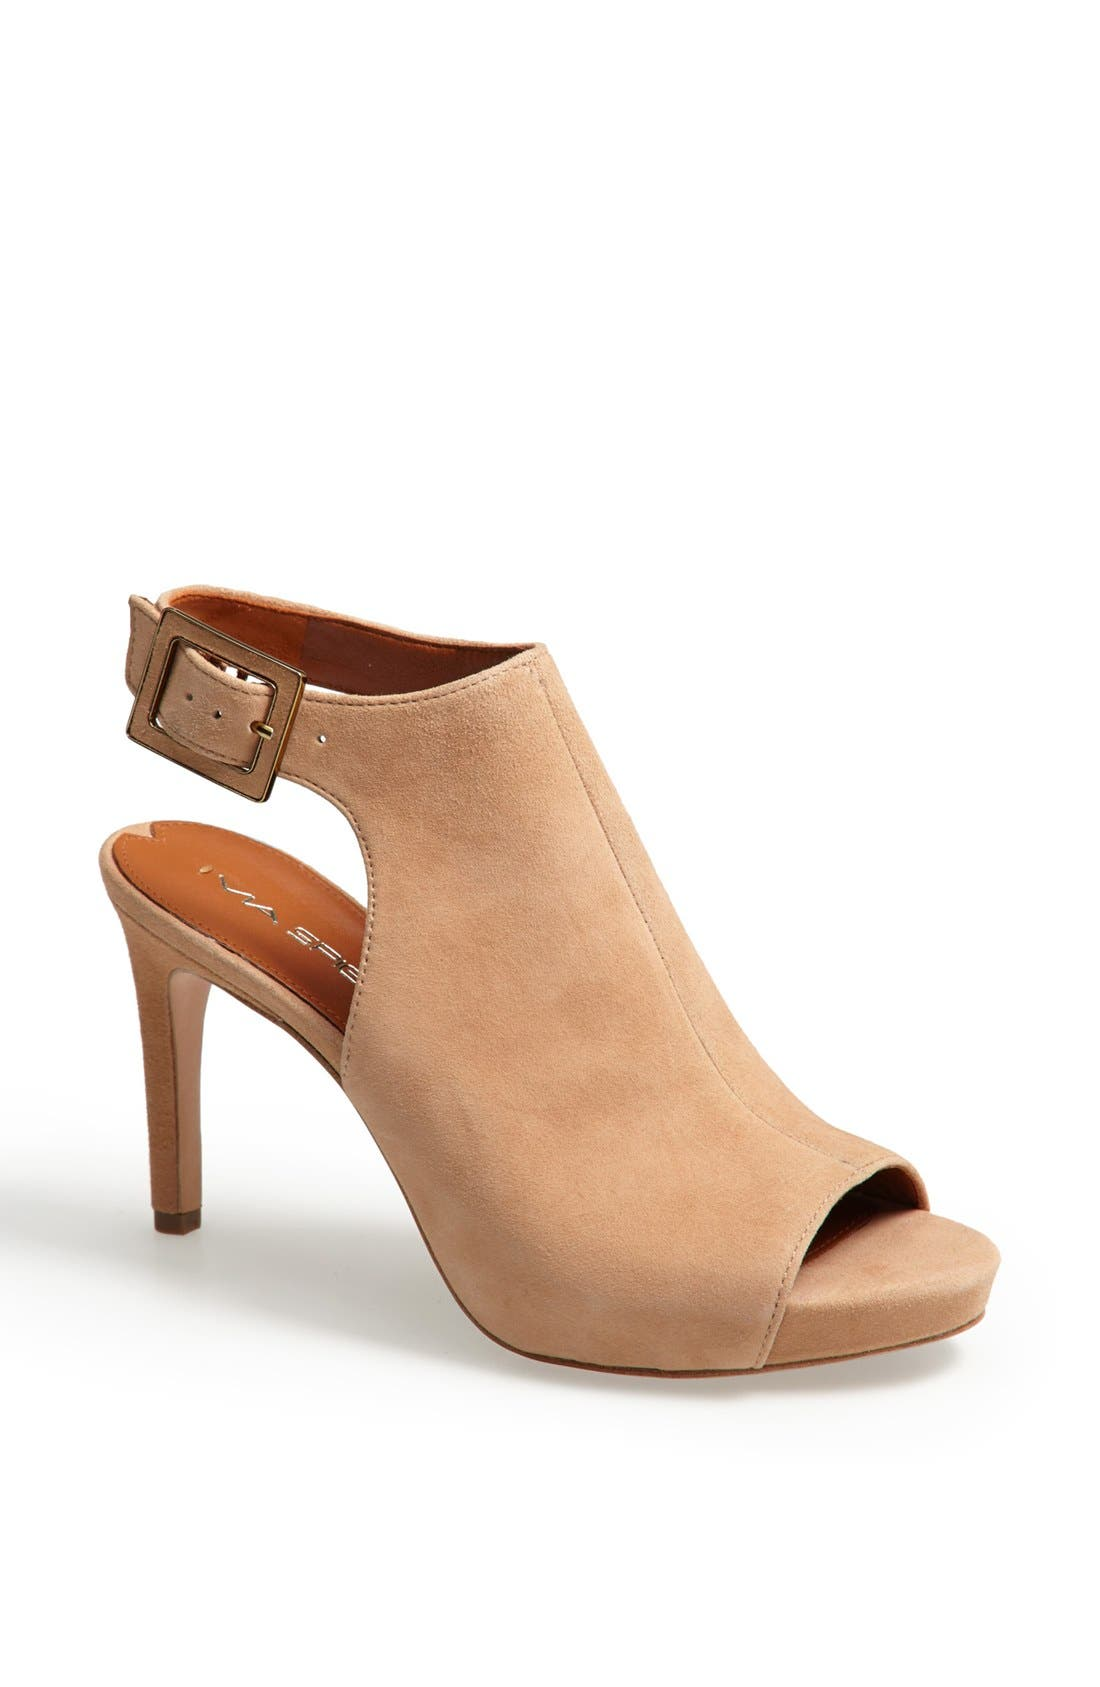 Main Image - Via Spiga 'Nino' Ankle Strap Sandal